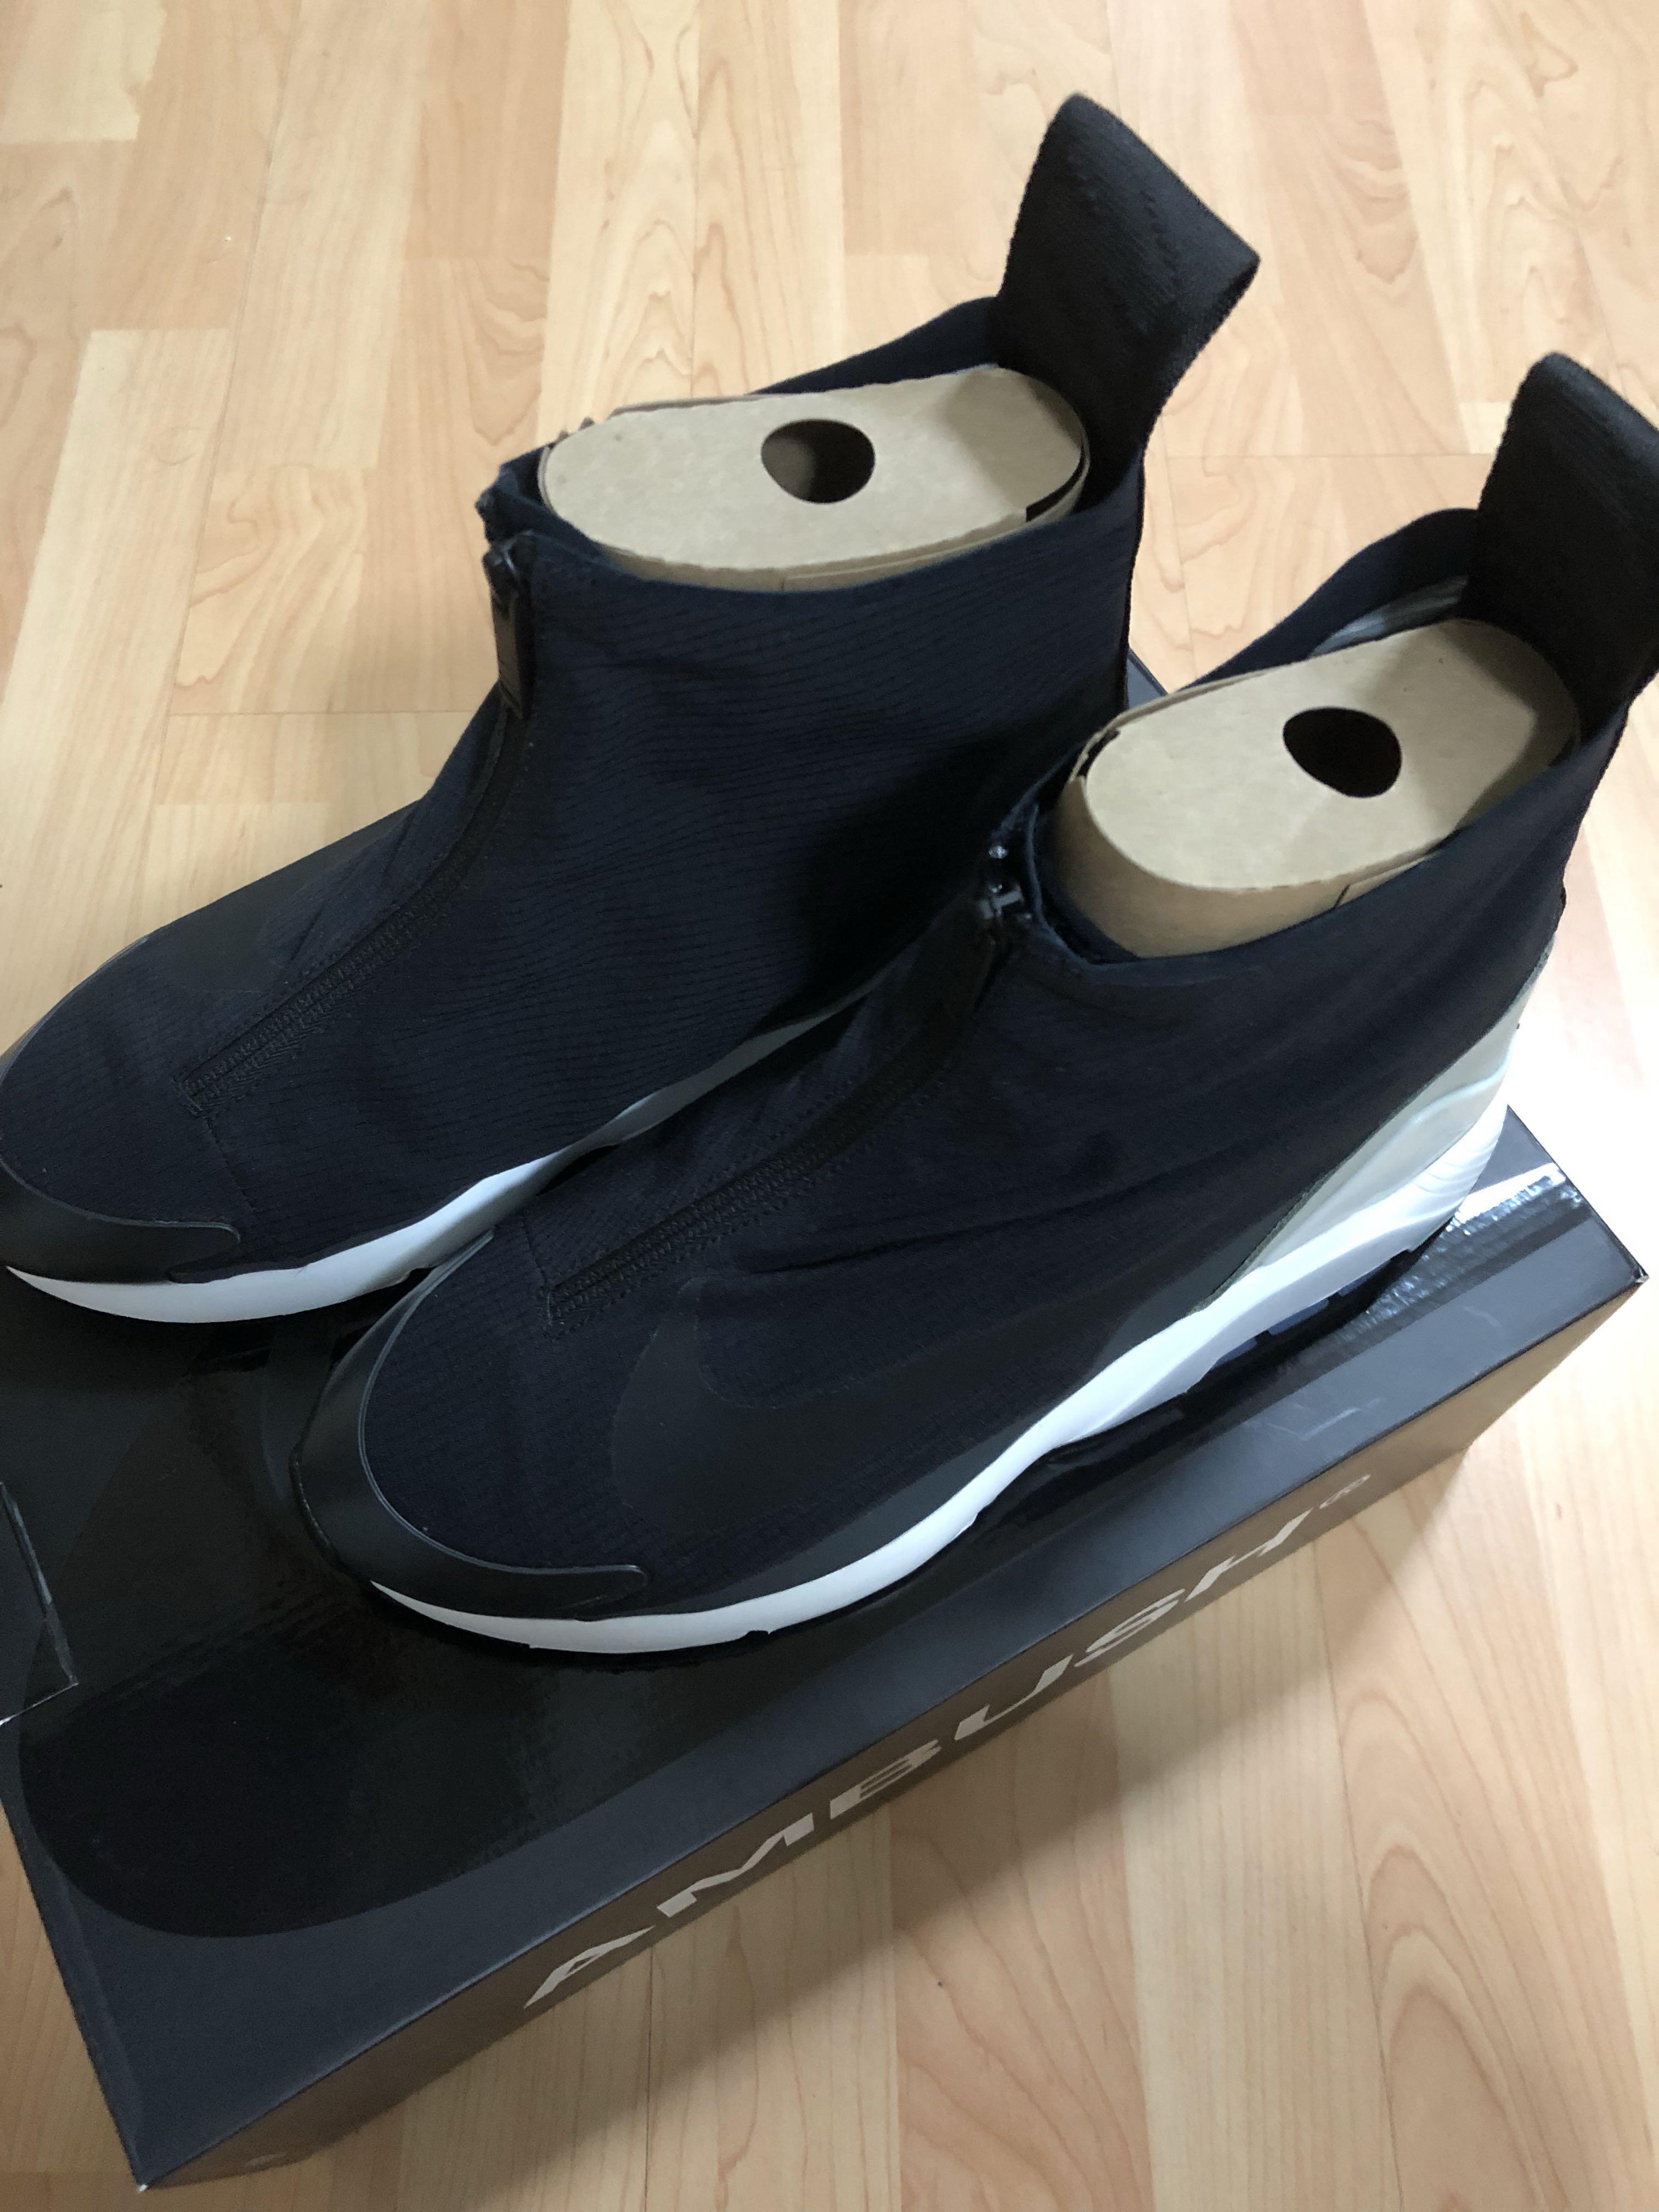 Details about Nike Air Max 180 X Ambush Black UK 9.5 BRAND NEW DEADSTOCK BNIB